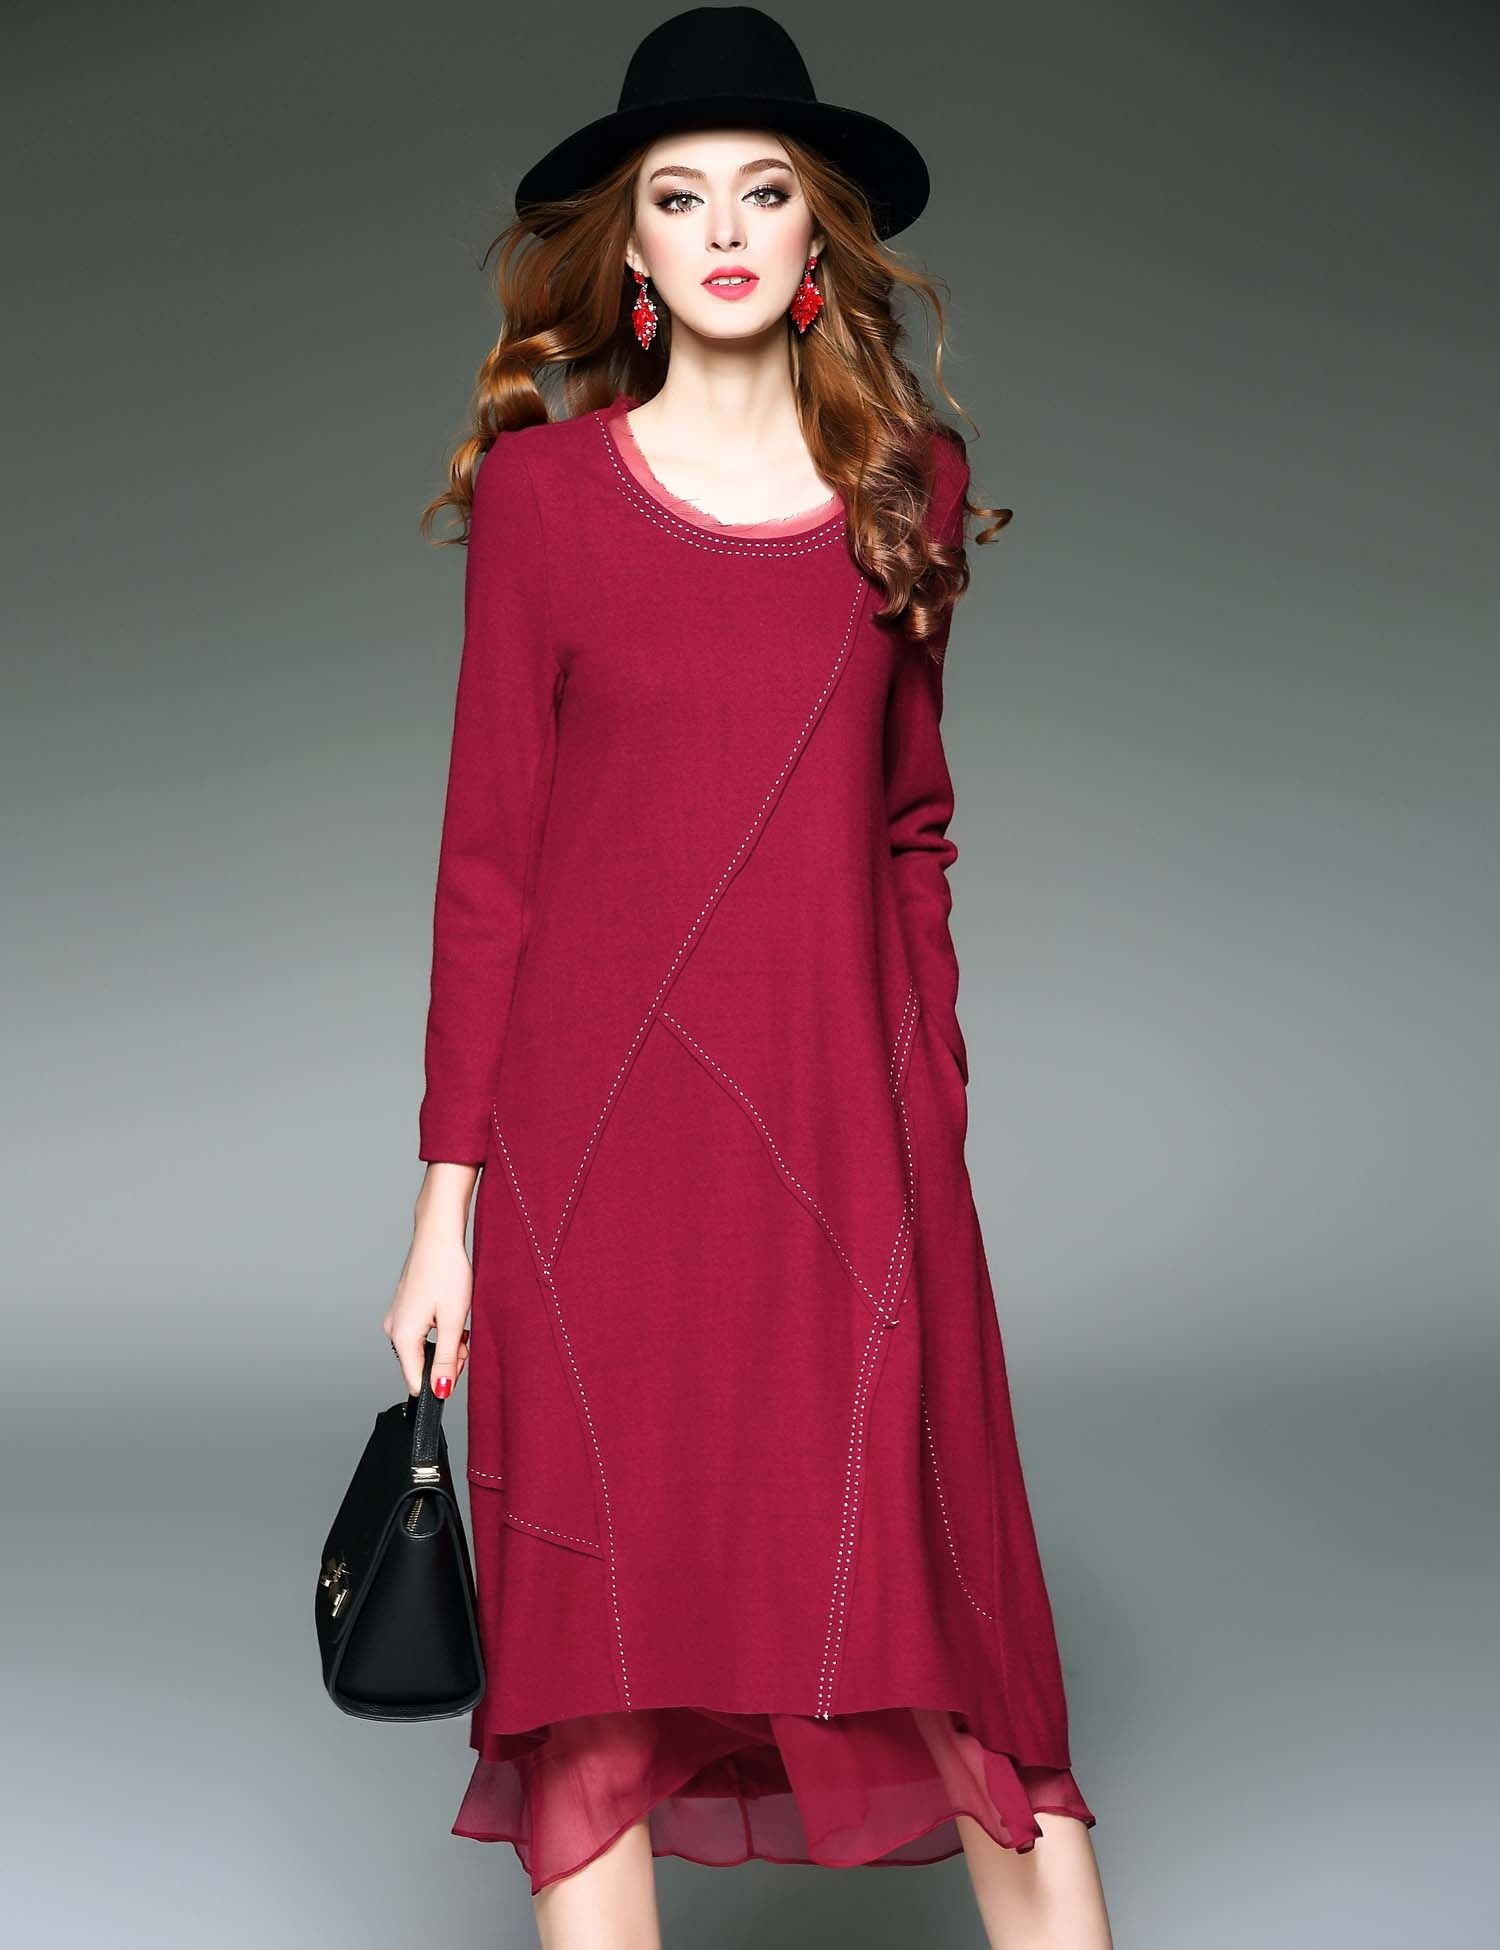 Black d fanni oneck long sleeve patchwork contrast color casual